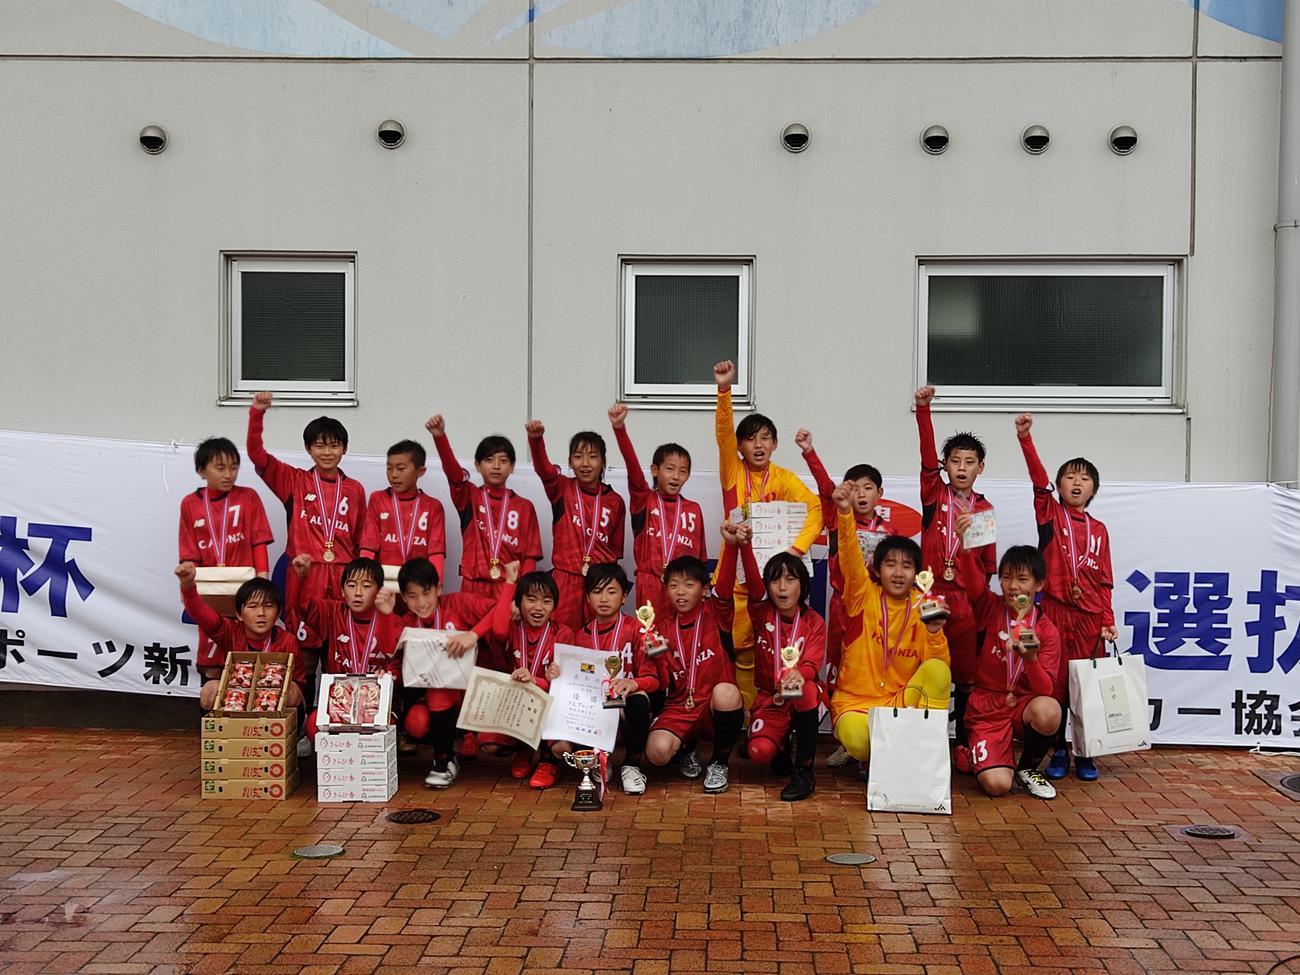 JA全農杯全国小学生選抜サッカーIN東海で優勝したFC ALONZA